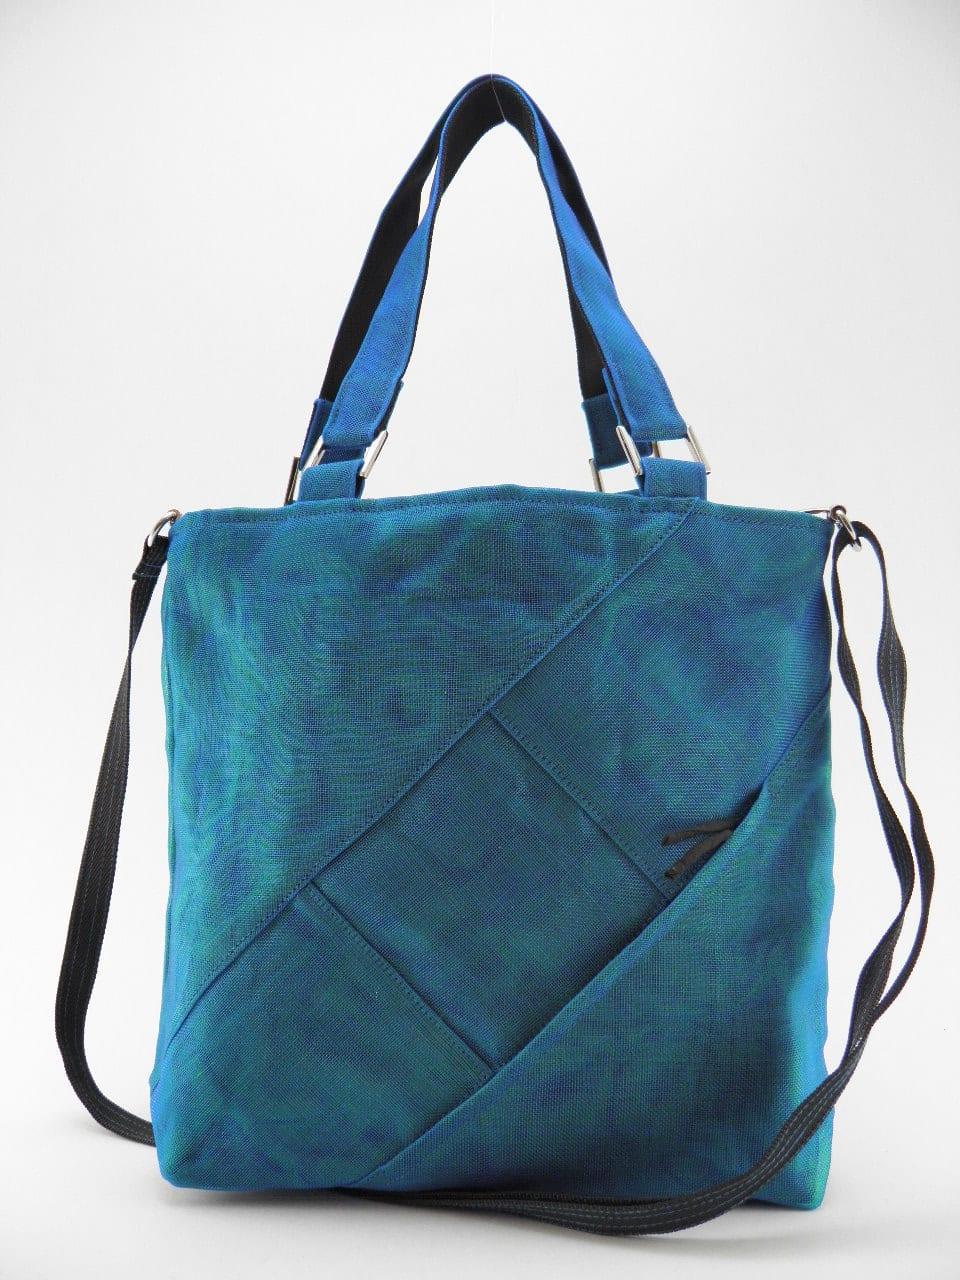 FAQ – Ethical Handbag - Medium - Oil blue - strap